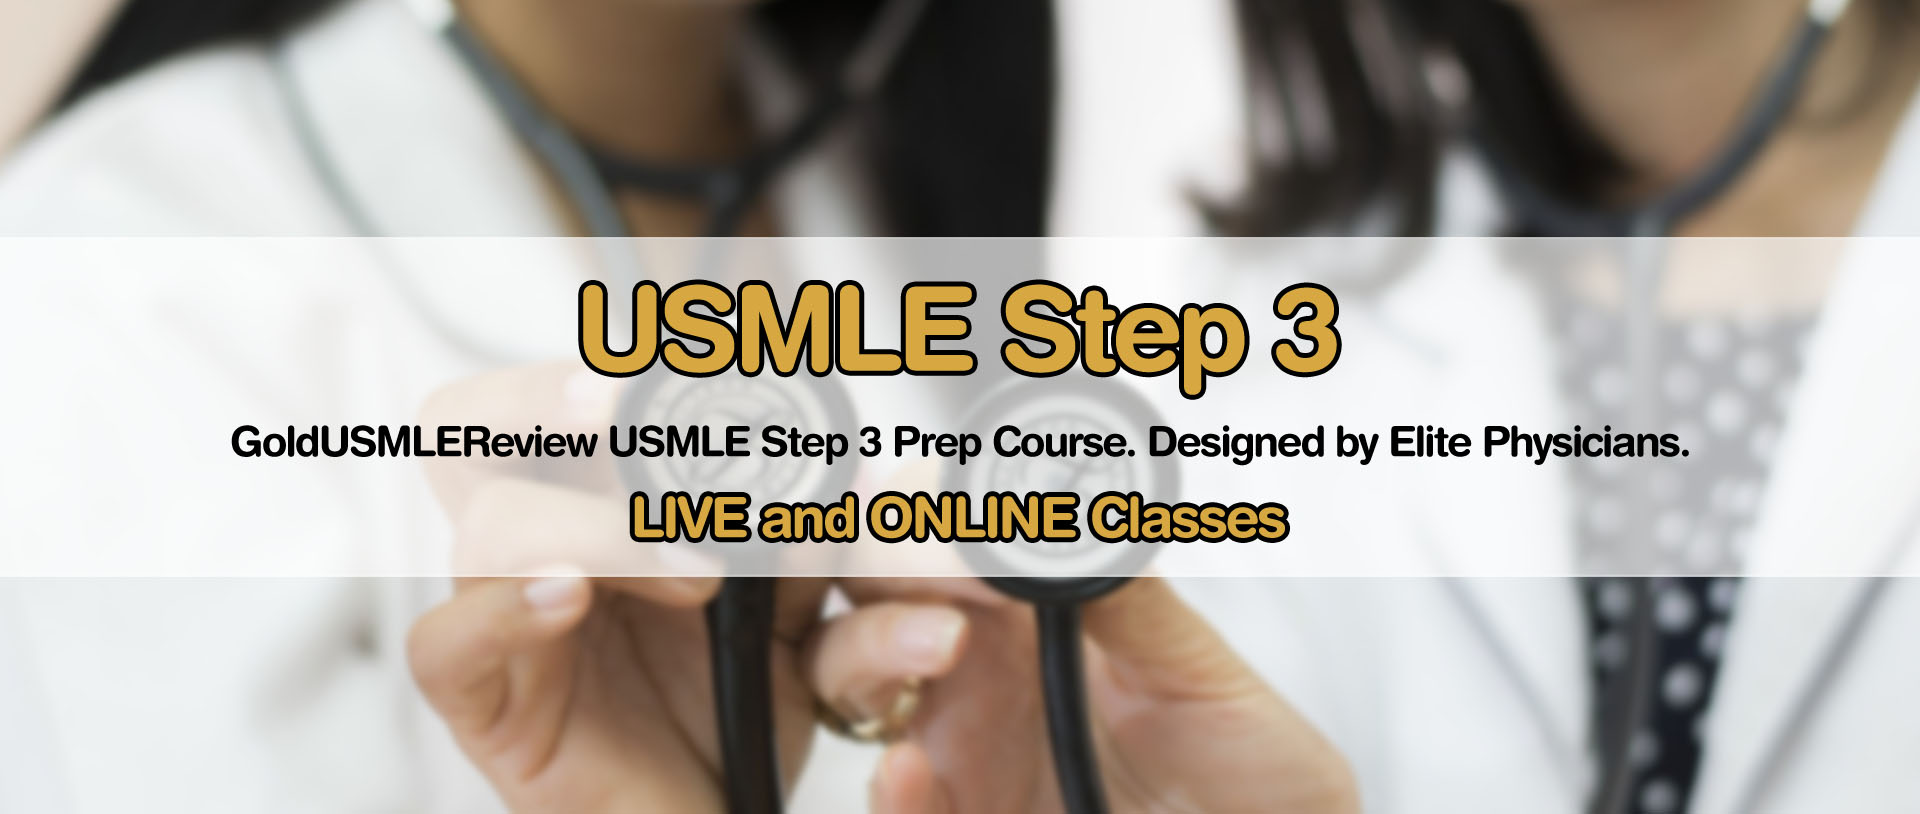 USMLE Step 3